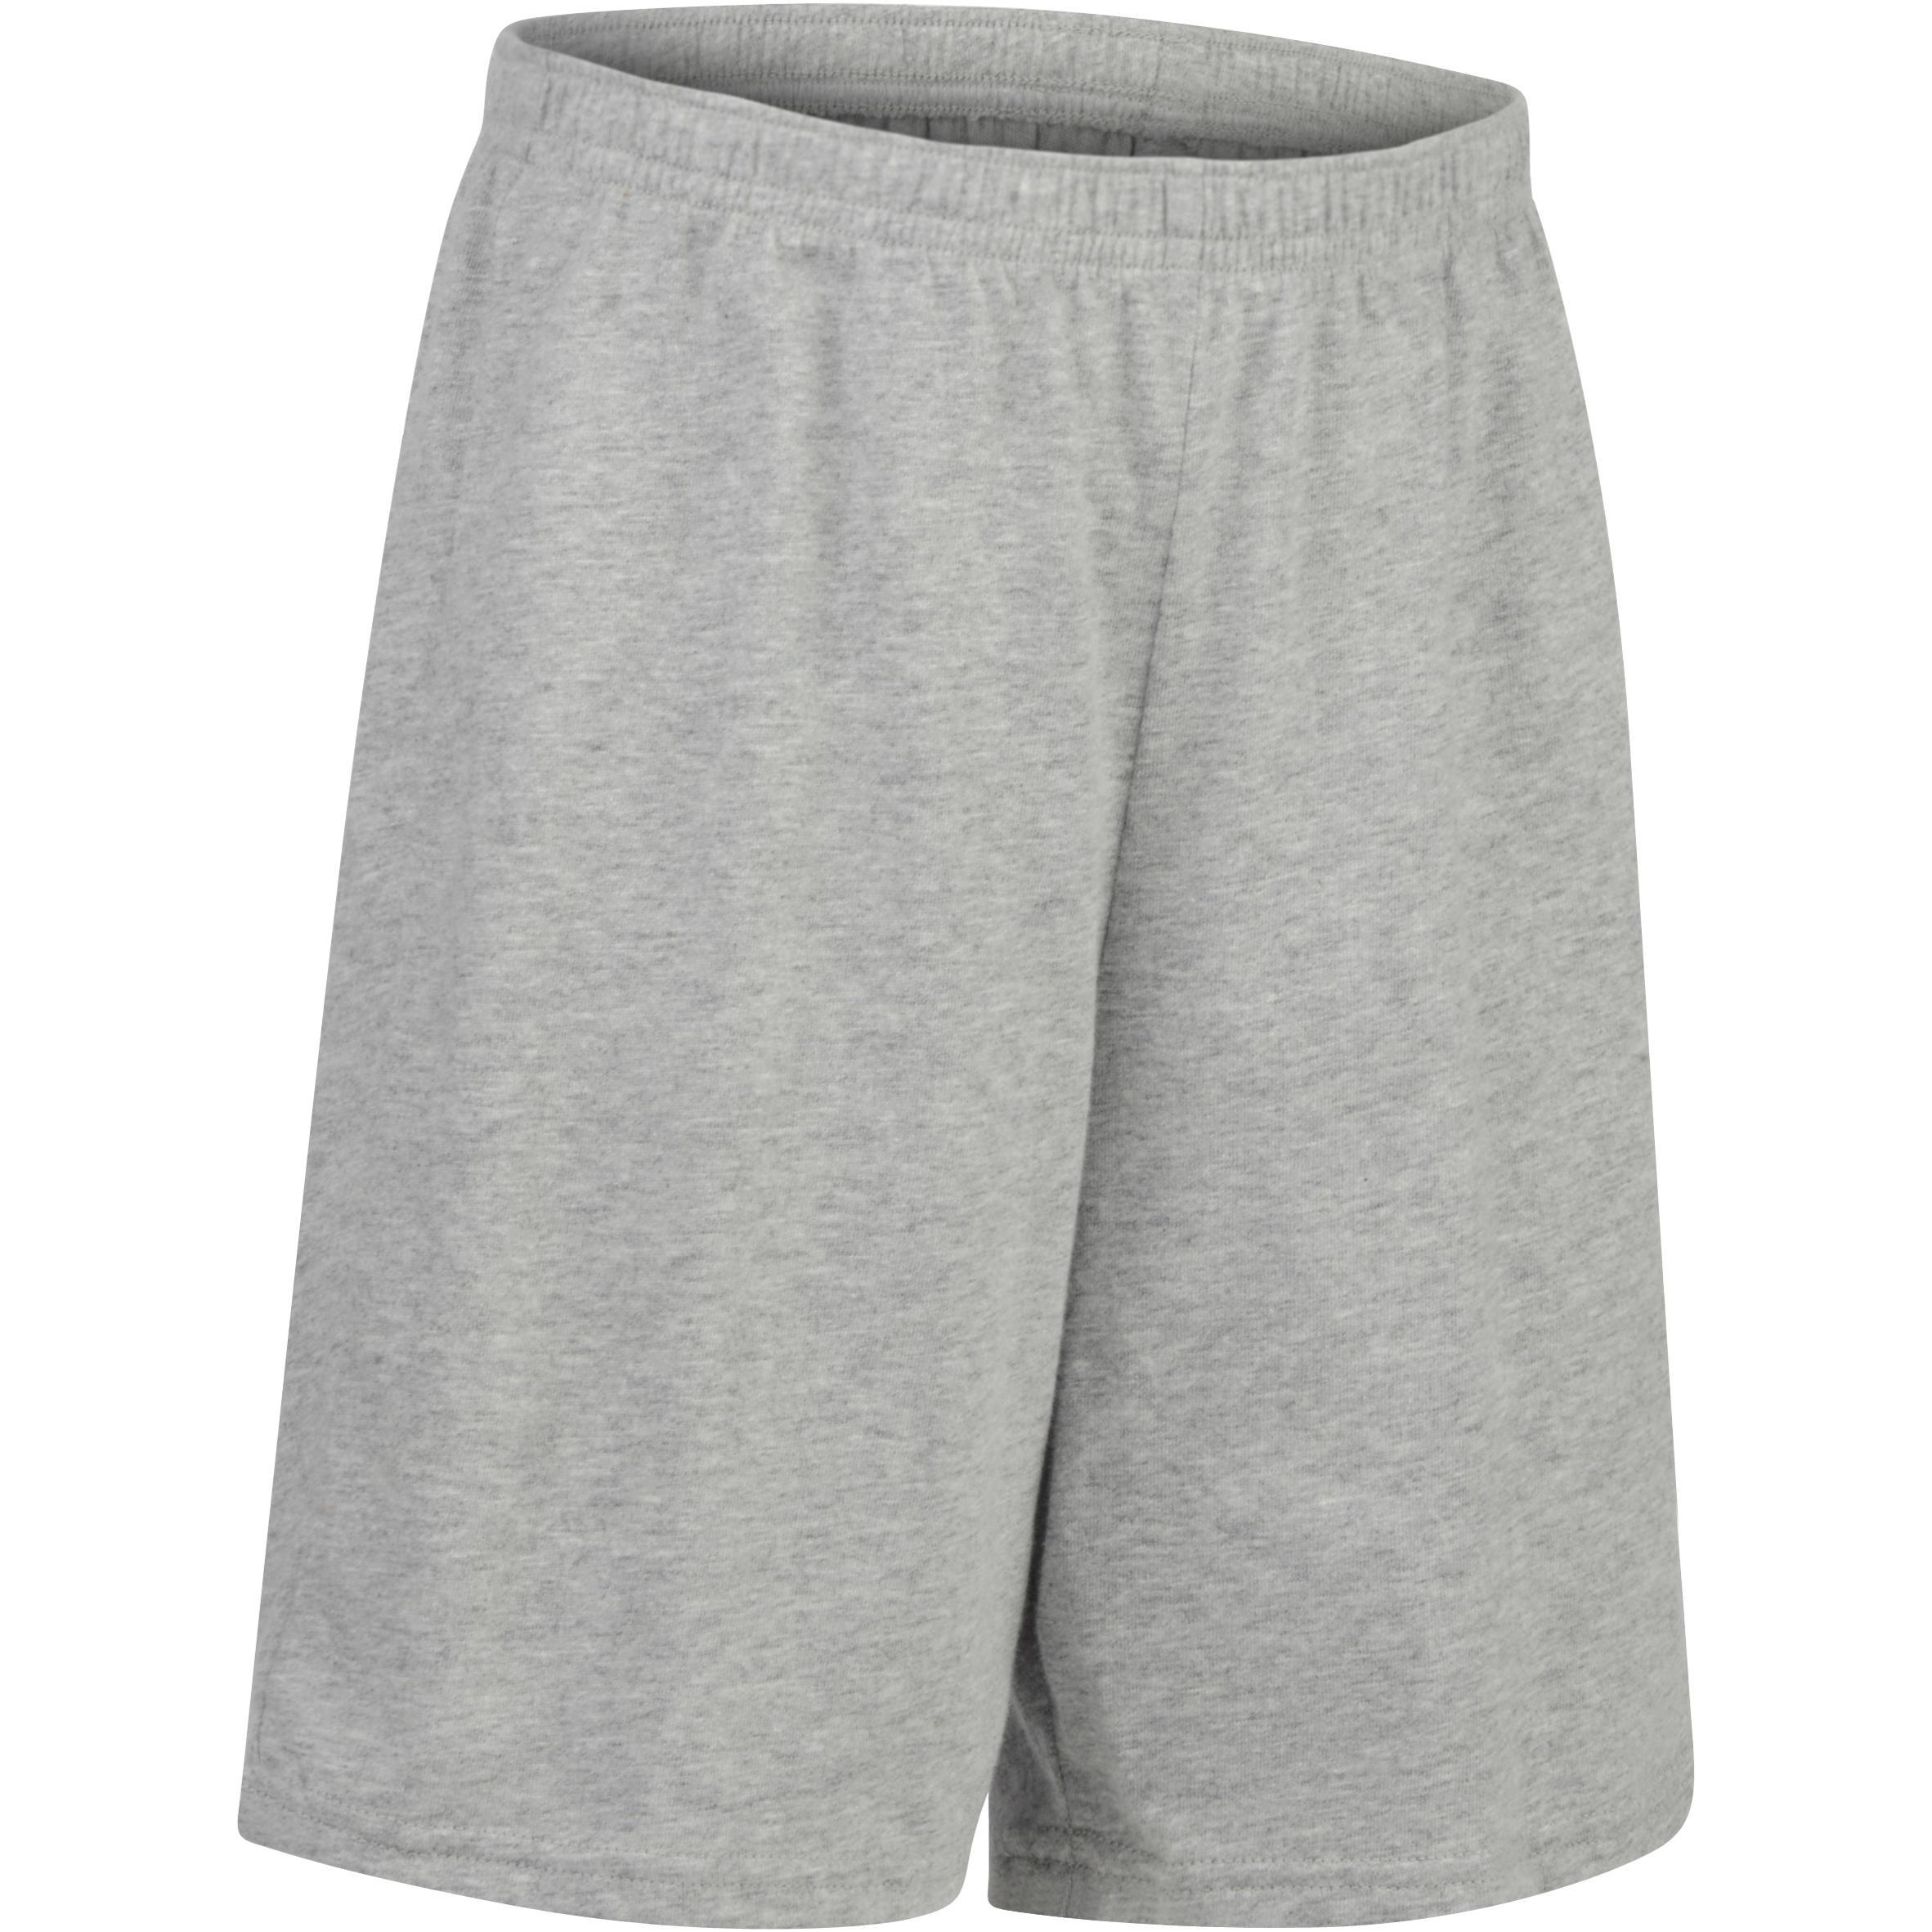 Short 100 gimnasia niño gris